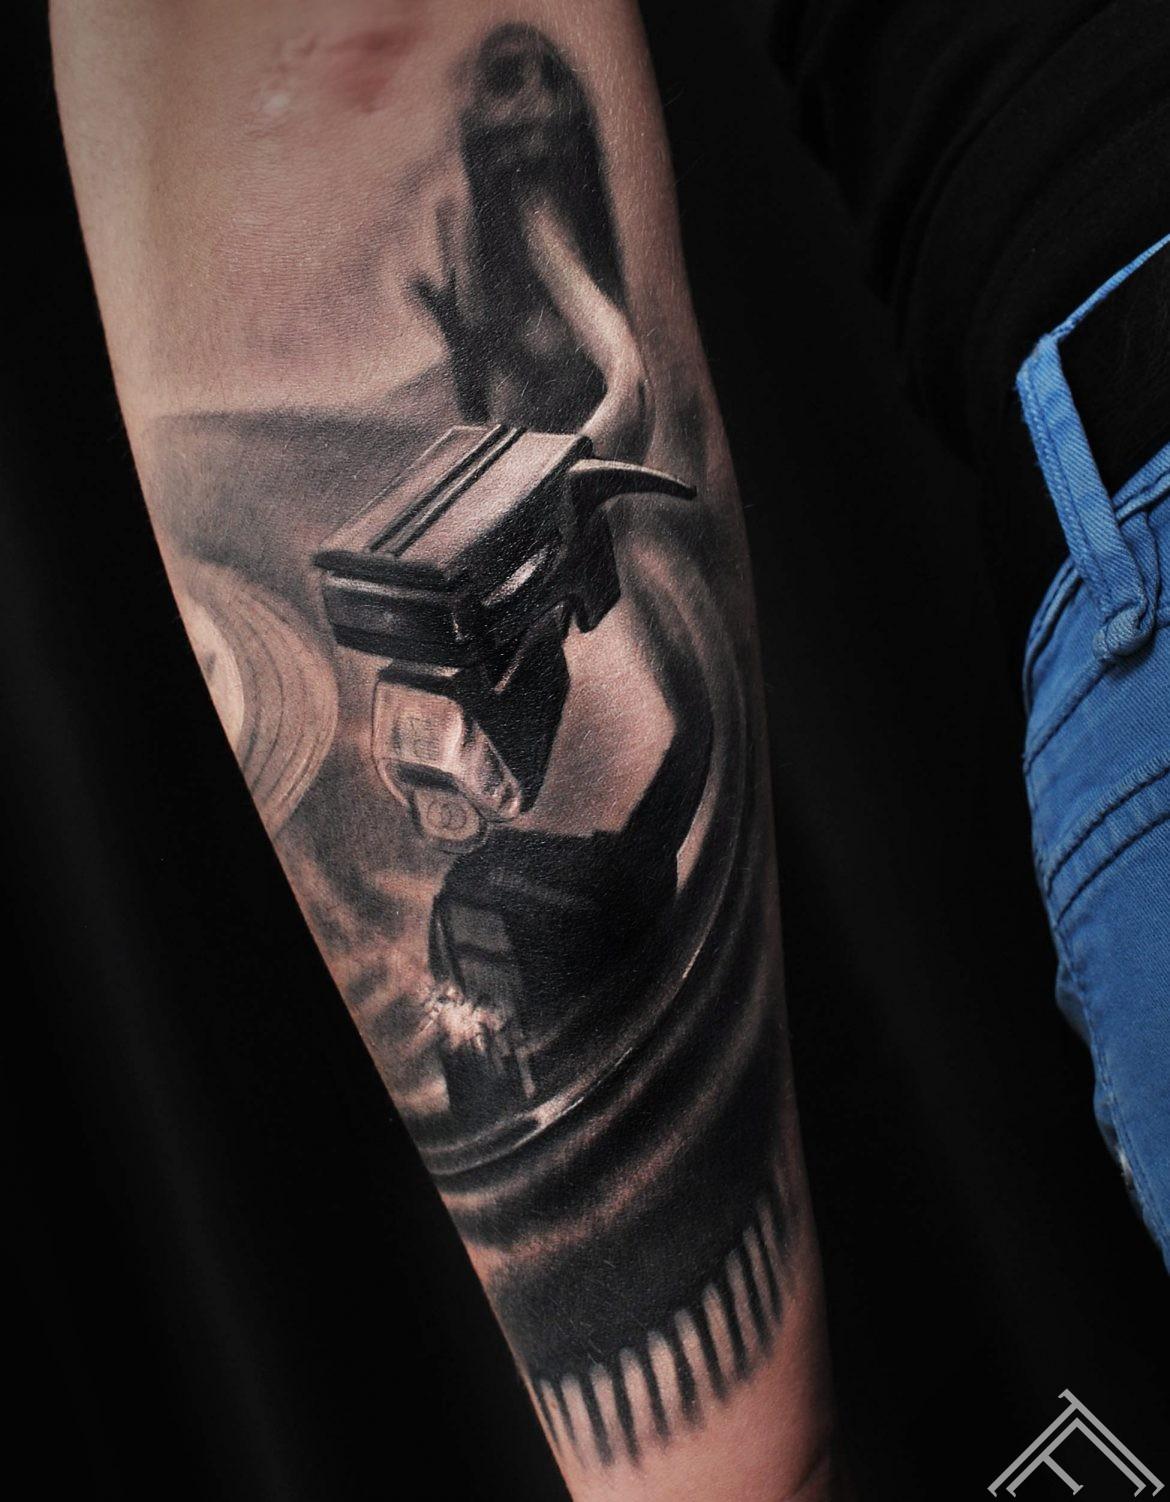 dj-vinil-music-art-muzika-plate-tattoo-tetovejums-riga-marispavlo